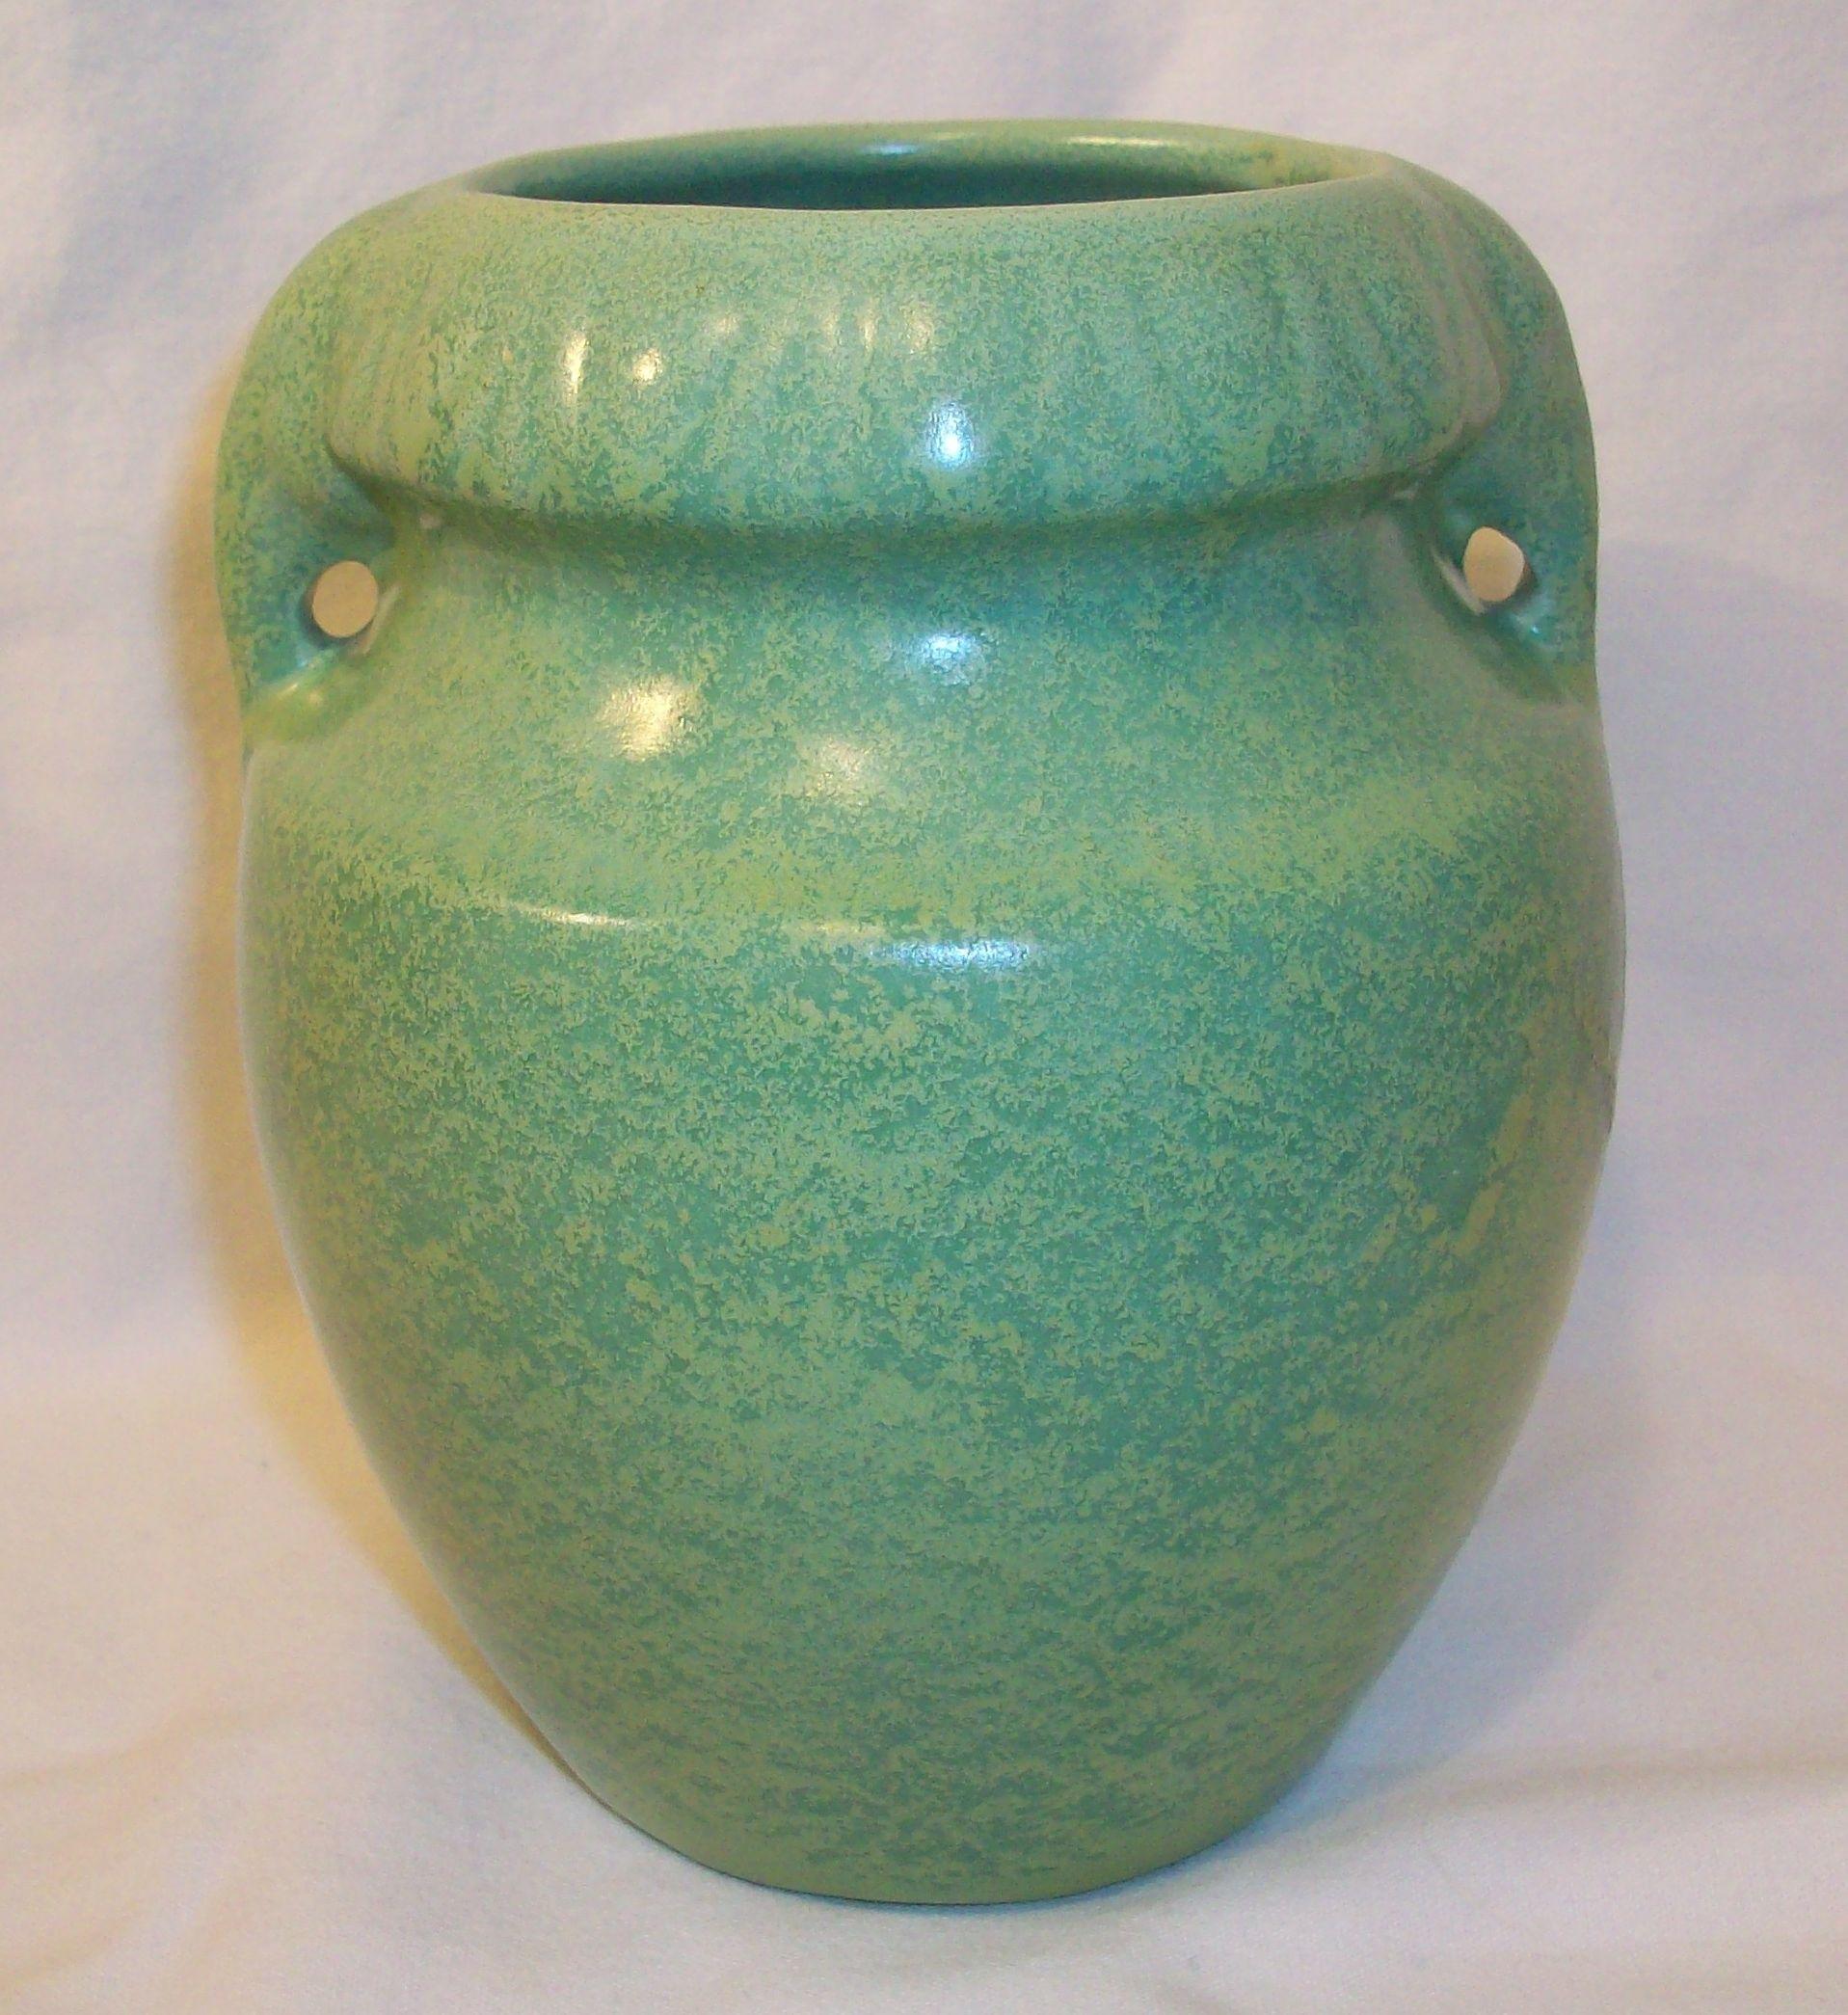 Vintage 1930s haeger pottery elephant handled geranium leaf green vintage 1930s haeger pottery elephant handled geranium leaf green glazed vase reviewsmspy